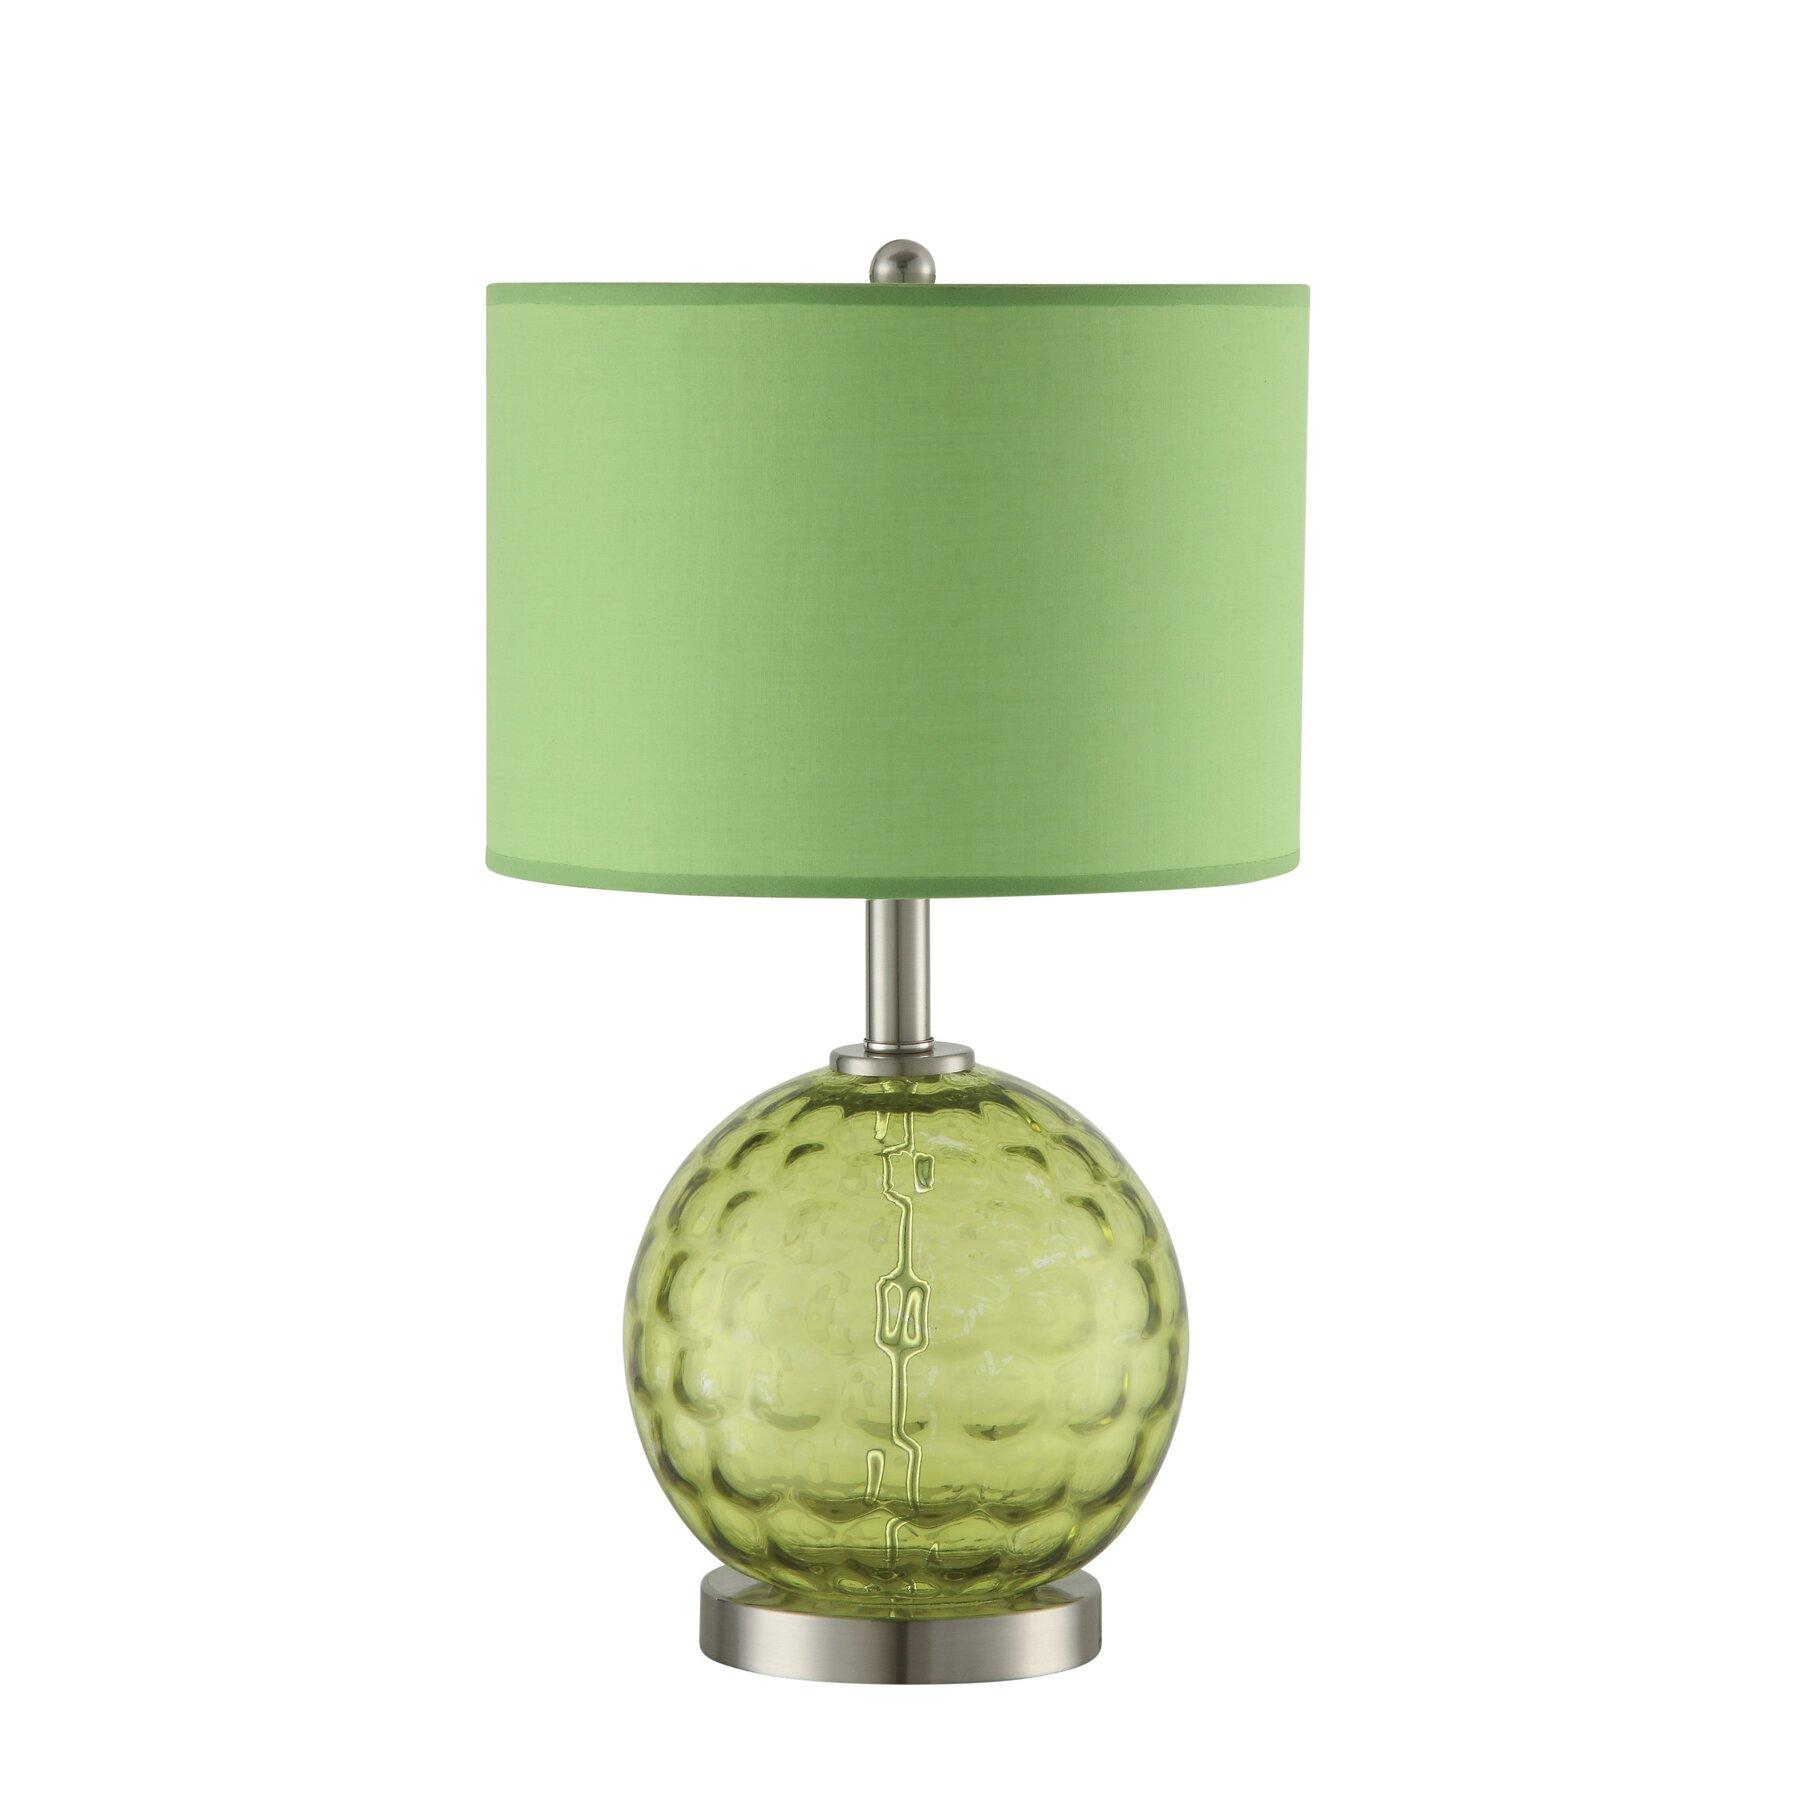 lighting chandeliers pendants flush mounts table lamps floor lamp. Black Bedroom Furniture Sets. Home Design Ideas